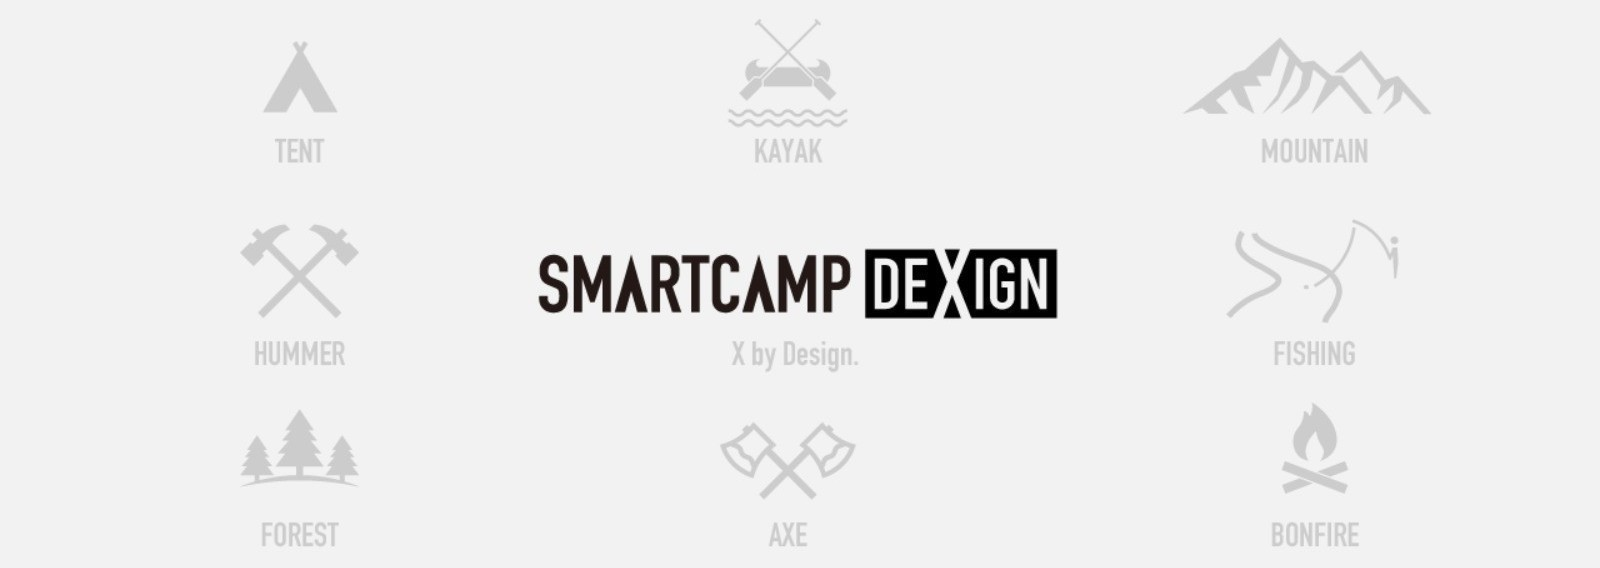 SMARTCAMP DEXIGN|note